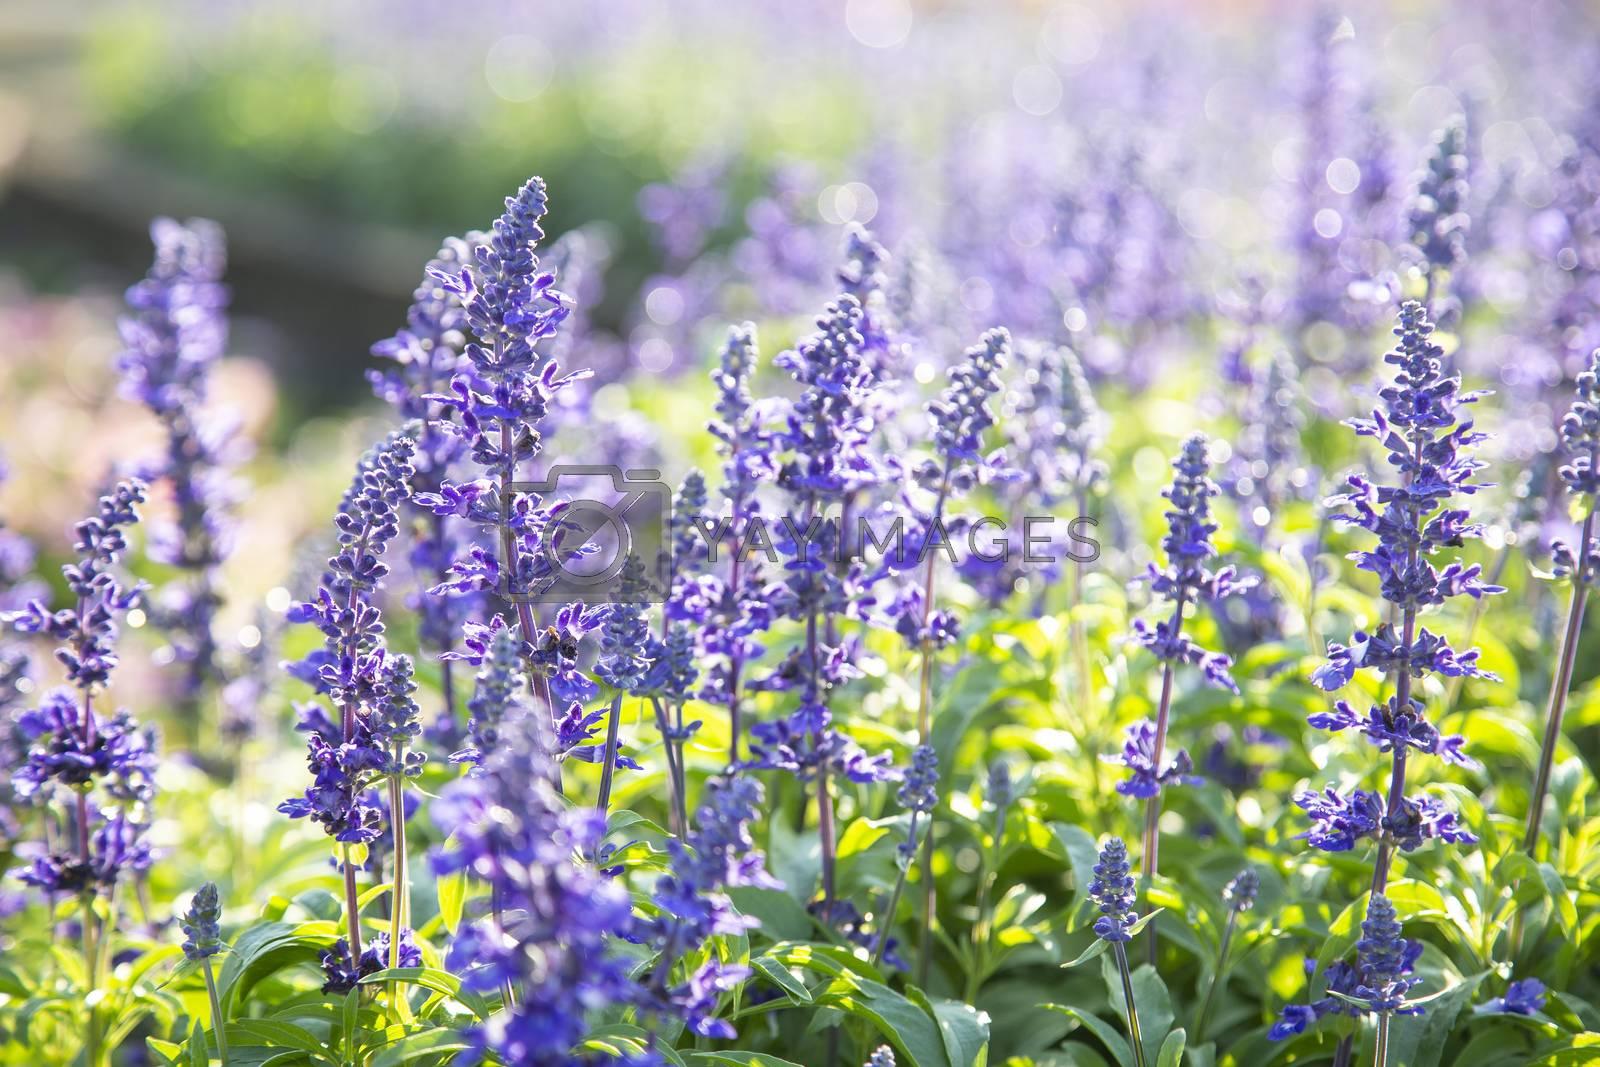 Closeup purple flowers (salvia officinalis) in the garden